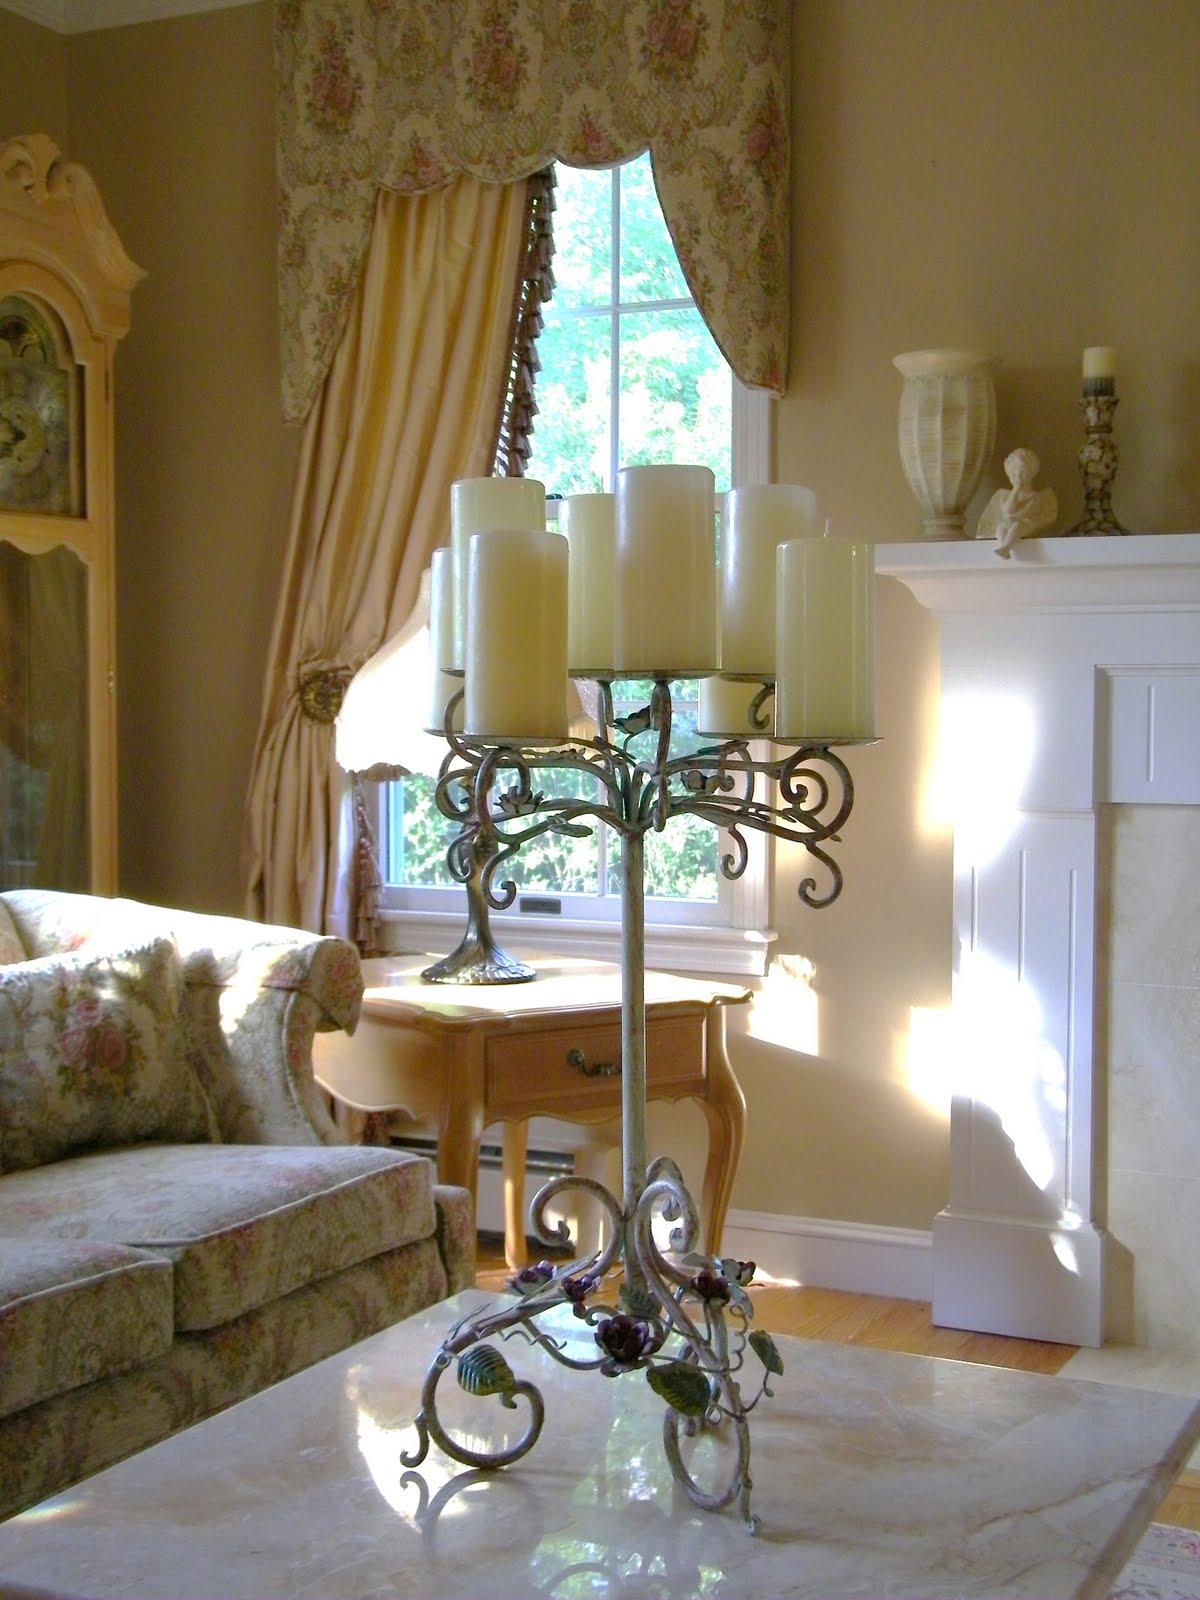 Romantic Living Room Decorating Ideas: Maison Decor: Romantic Living Room Update